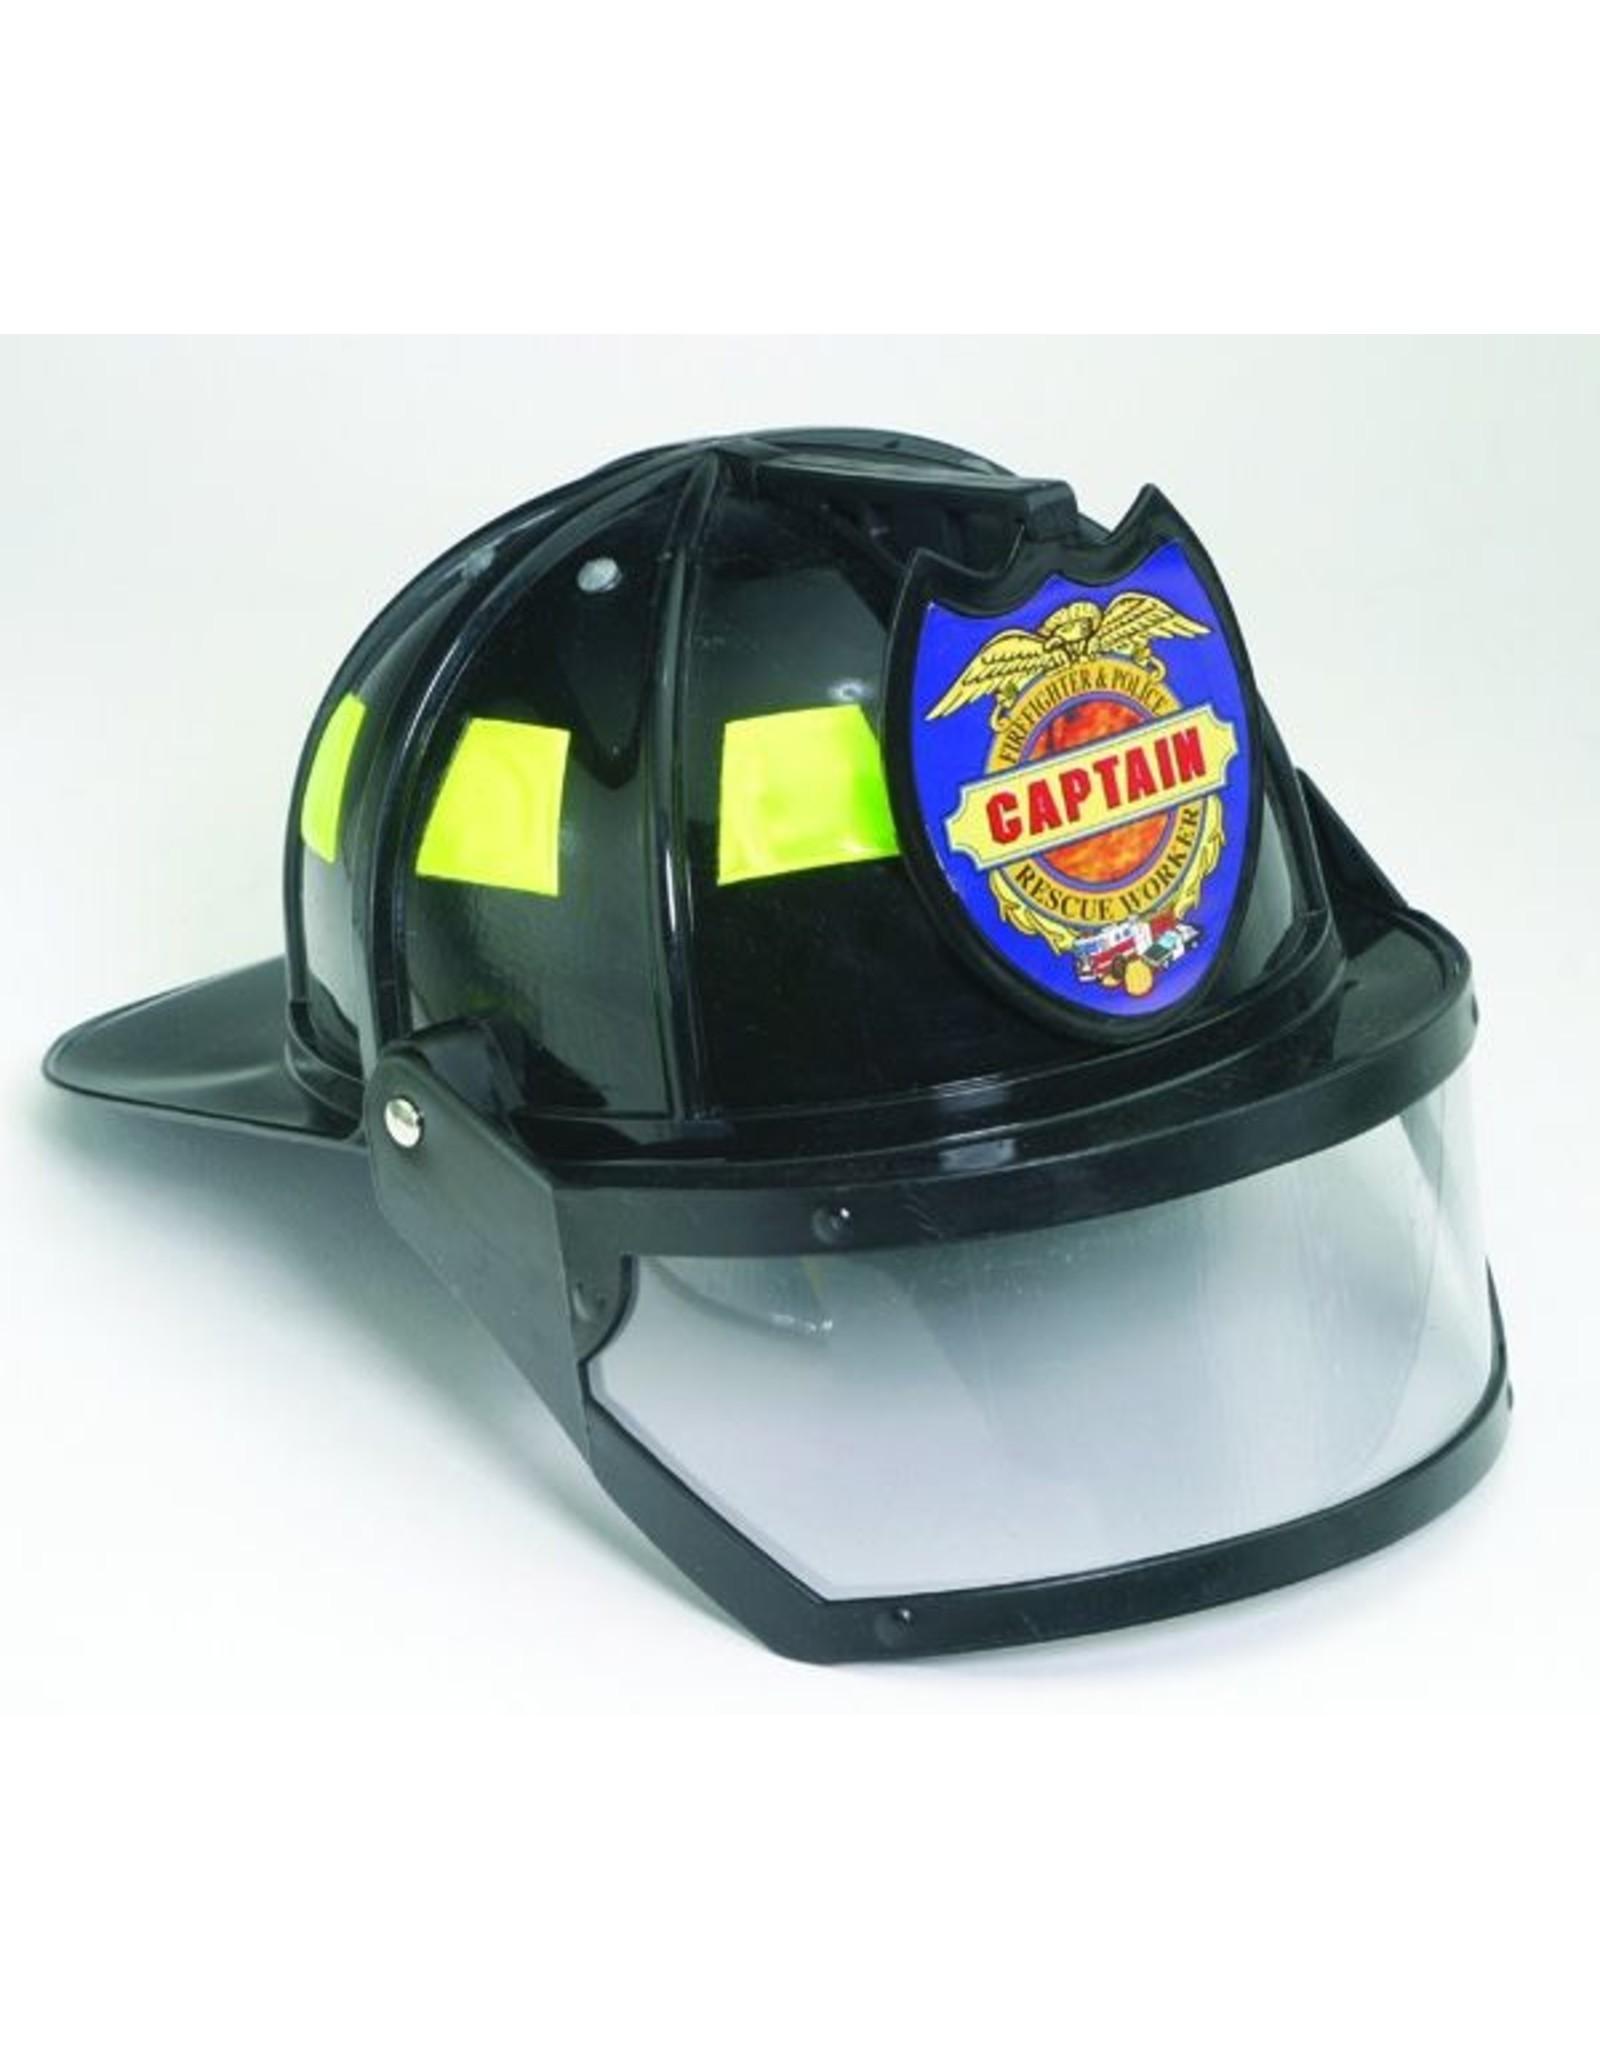 Jacobson Fireman Helmet